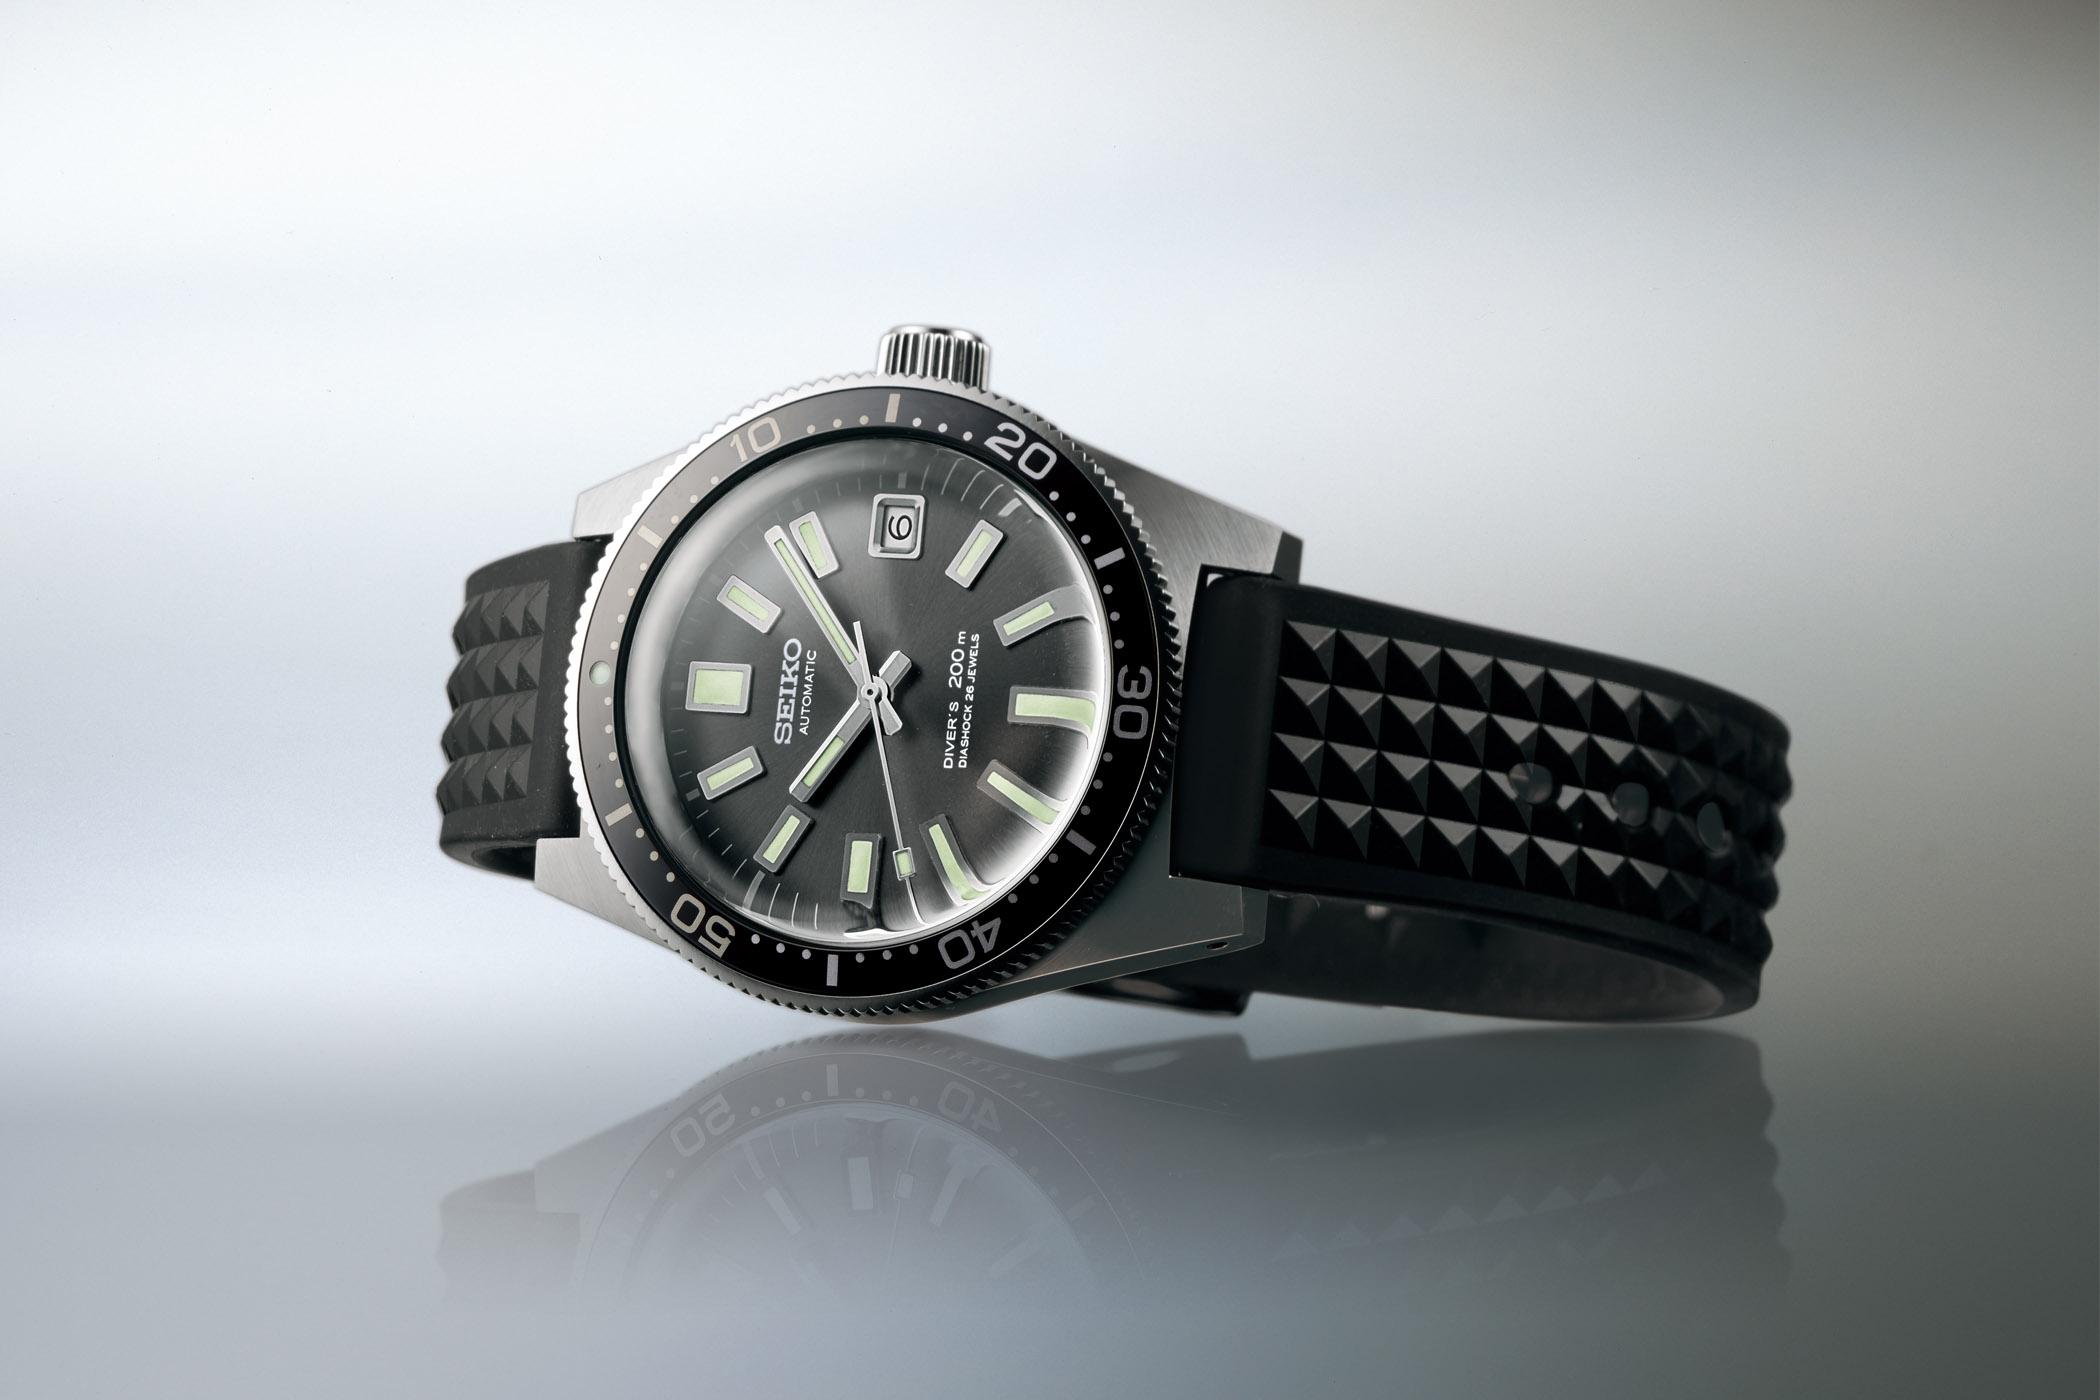 Seiko's First Dive Watch (62Mas) Prospex Reeditions SLA017 - SPB051 - SPB053 - Baselworld 2017